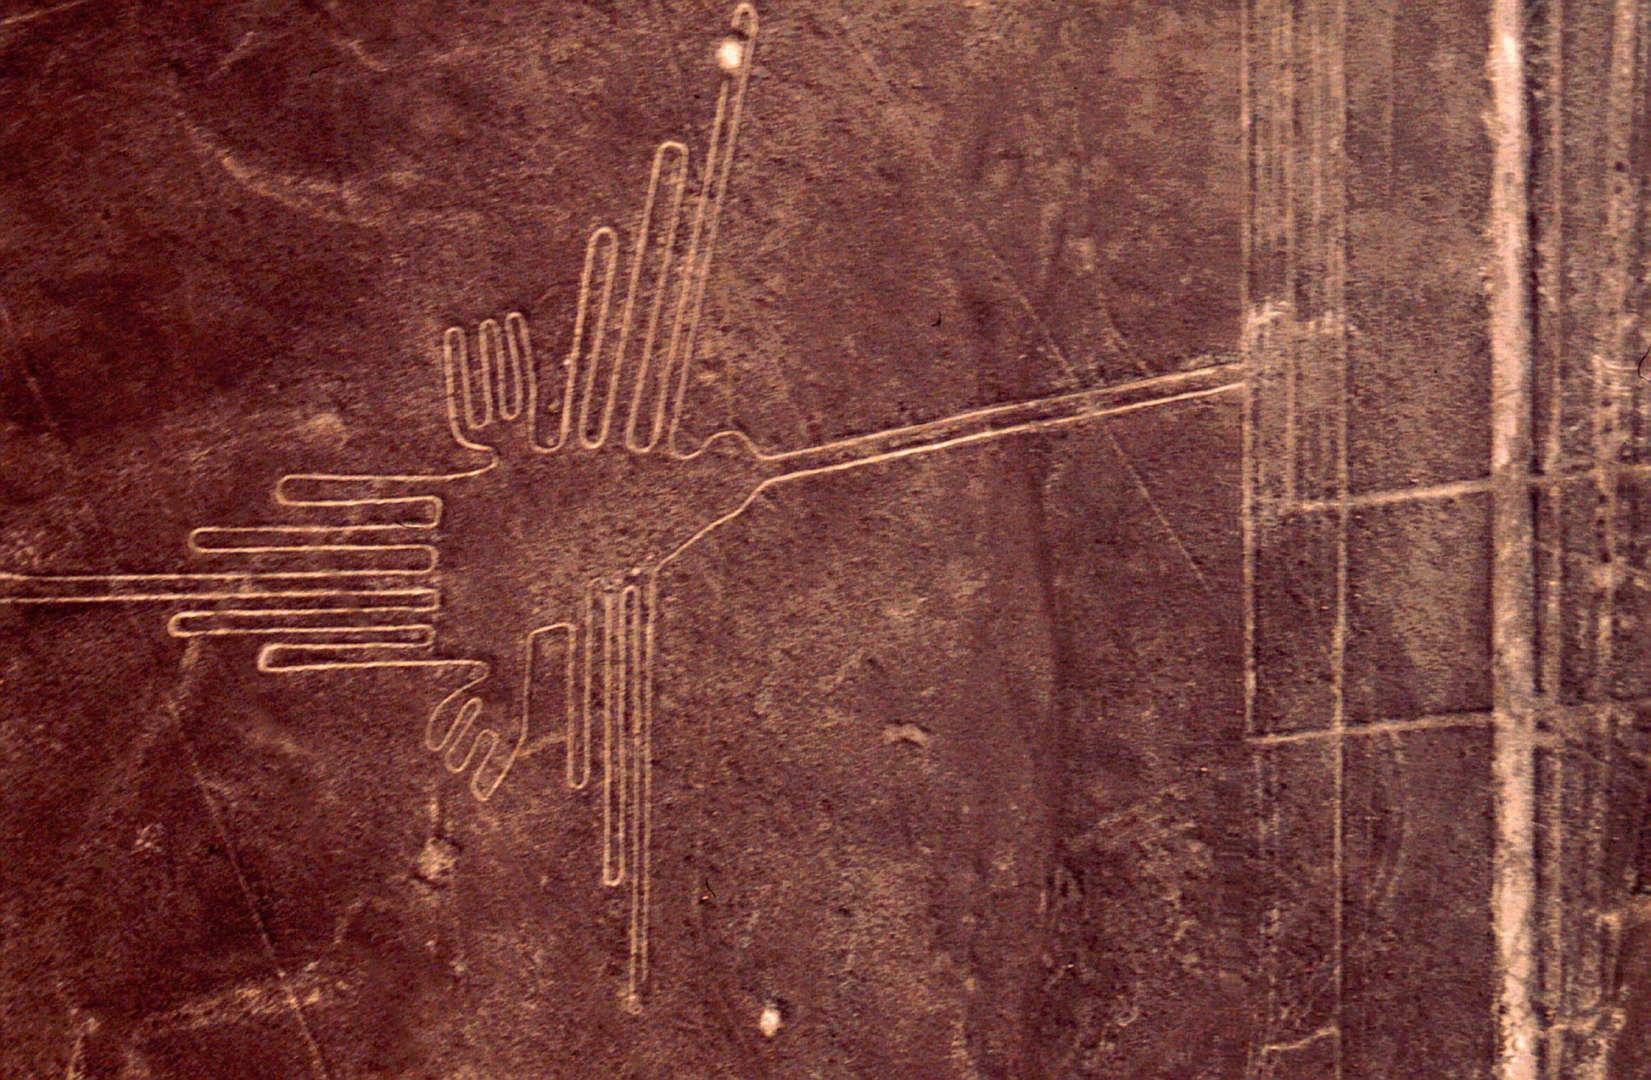 Conspiracy theories around UFOs